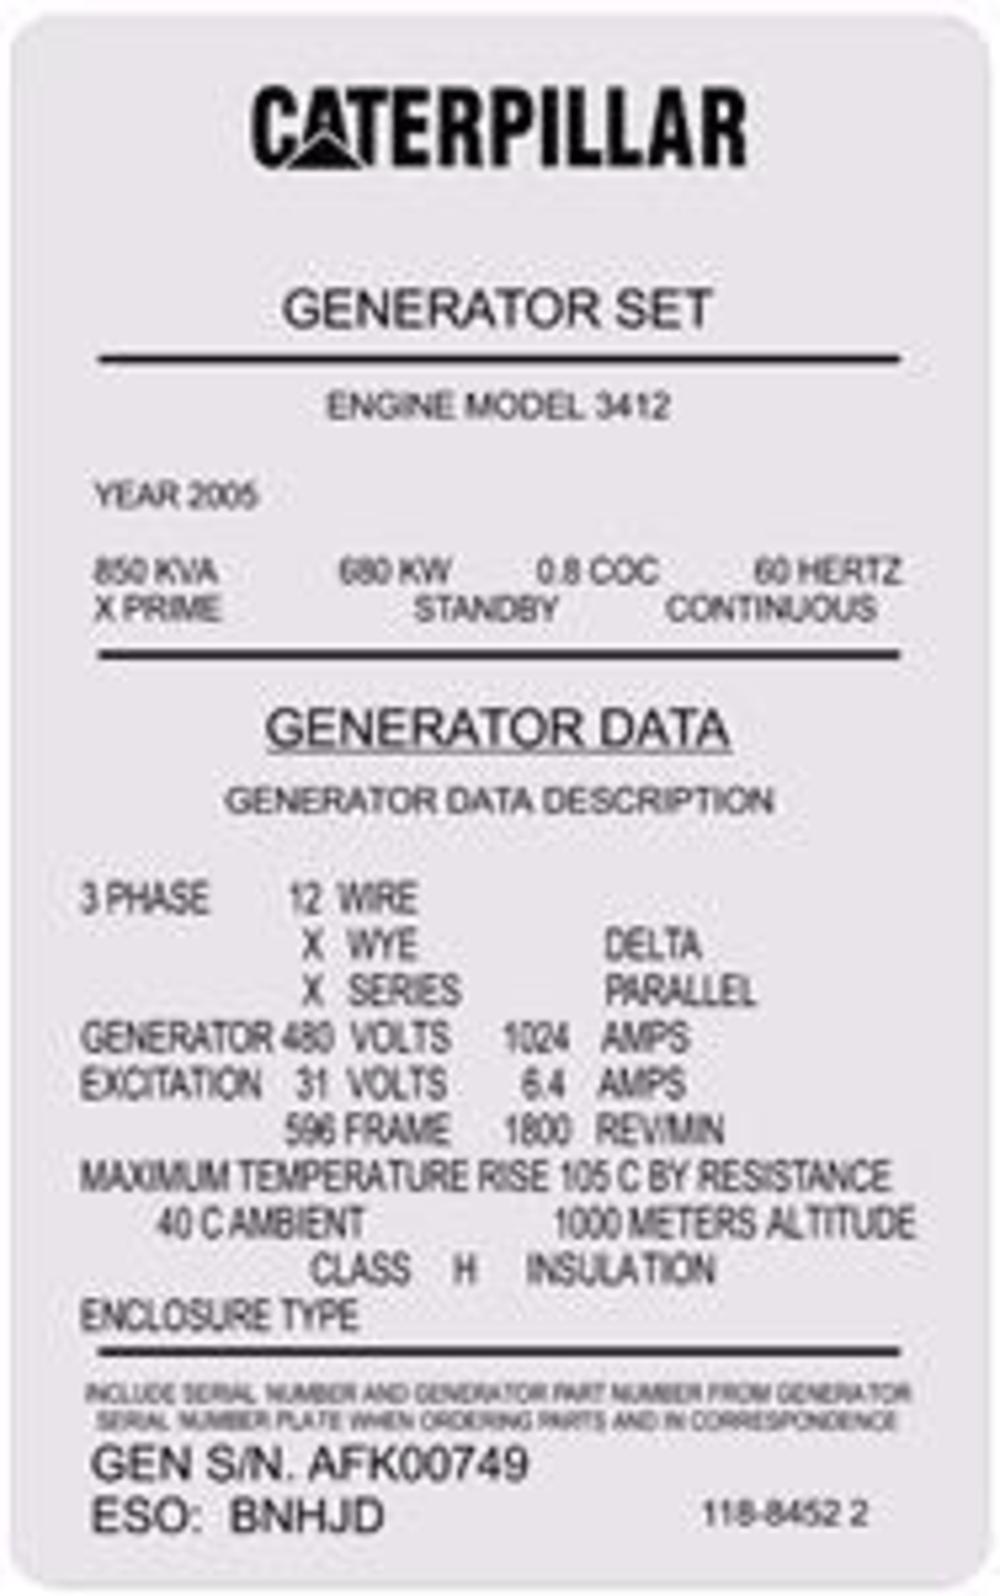 Caterpillar Generator Engine Model 3412 Replacement Chrome Decal